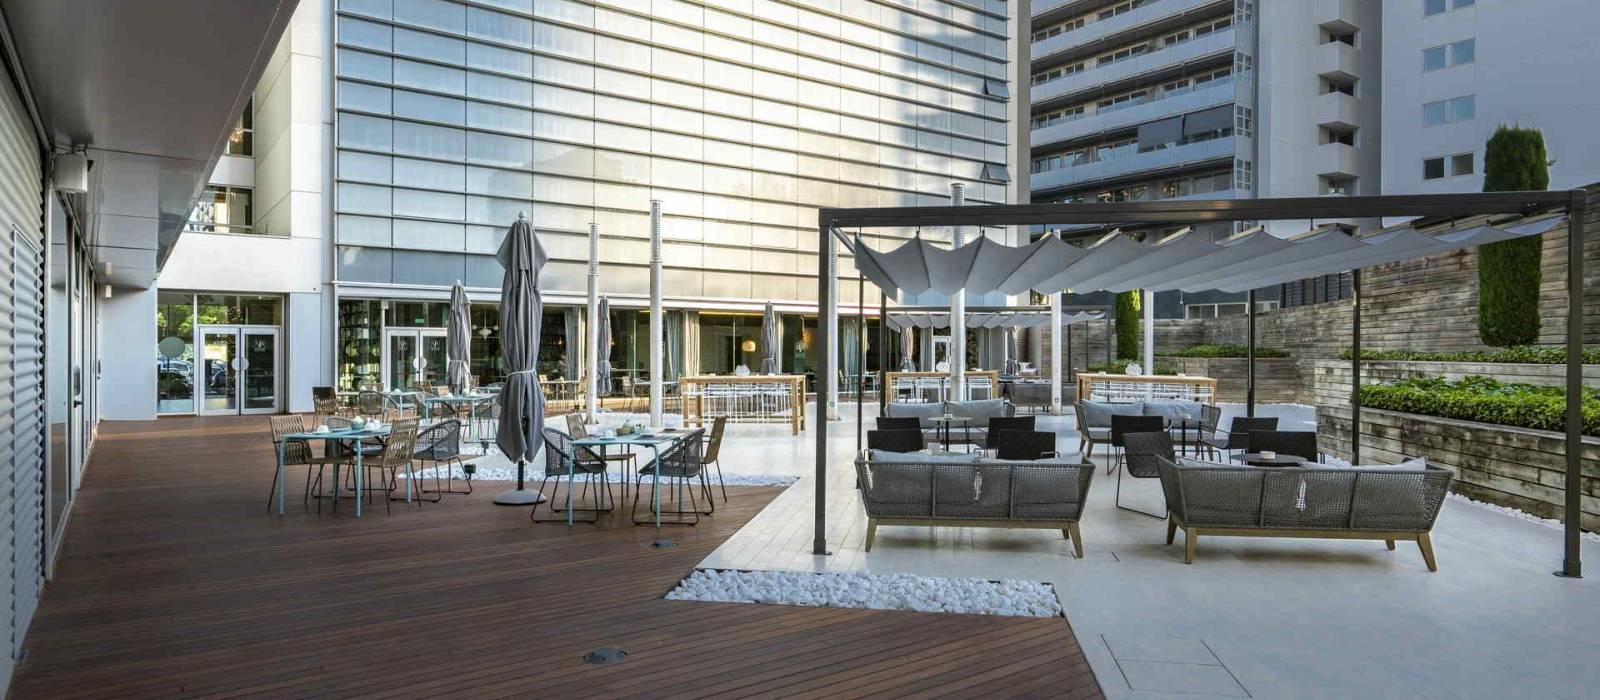 Services Hotel Barcelona Marítimo 2 - Vincci Hotels - Jardí de Mar Terrace